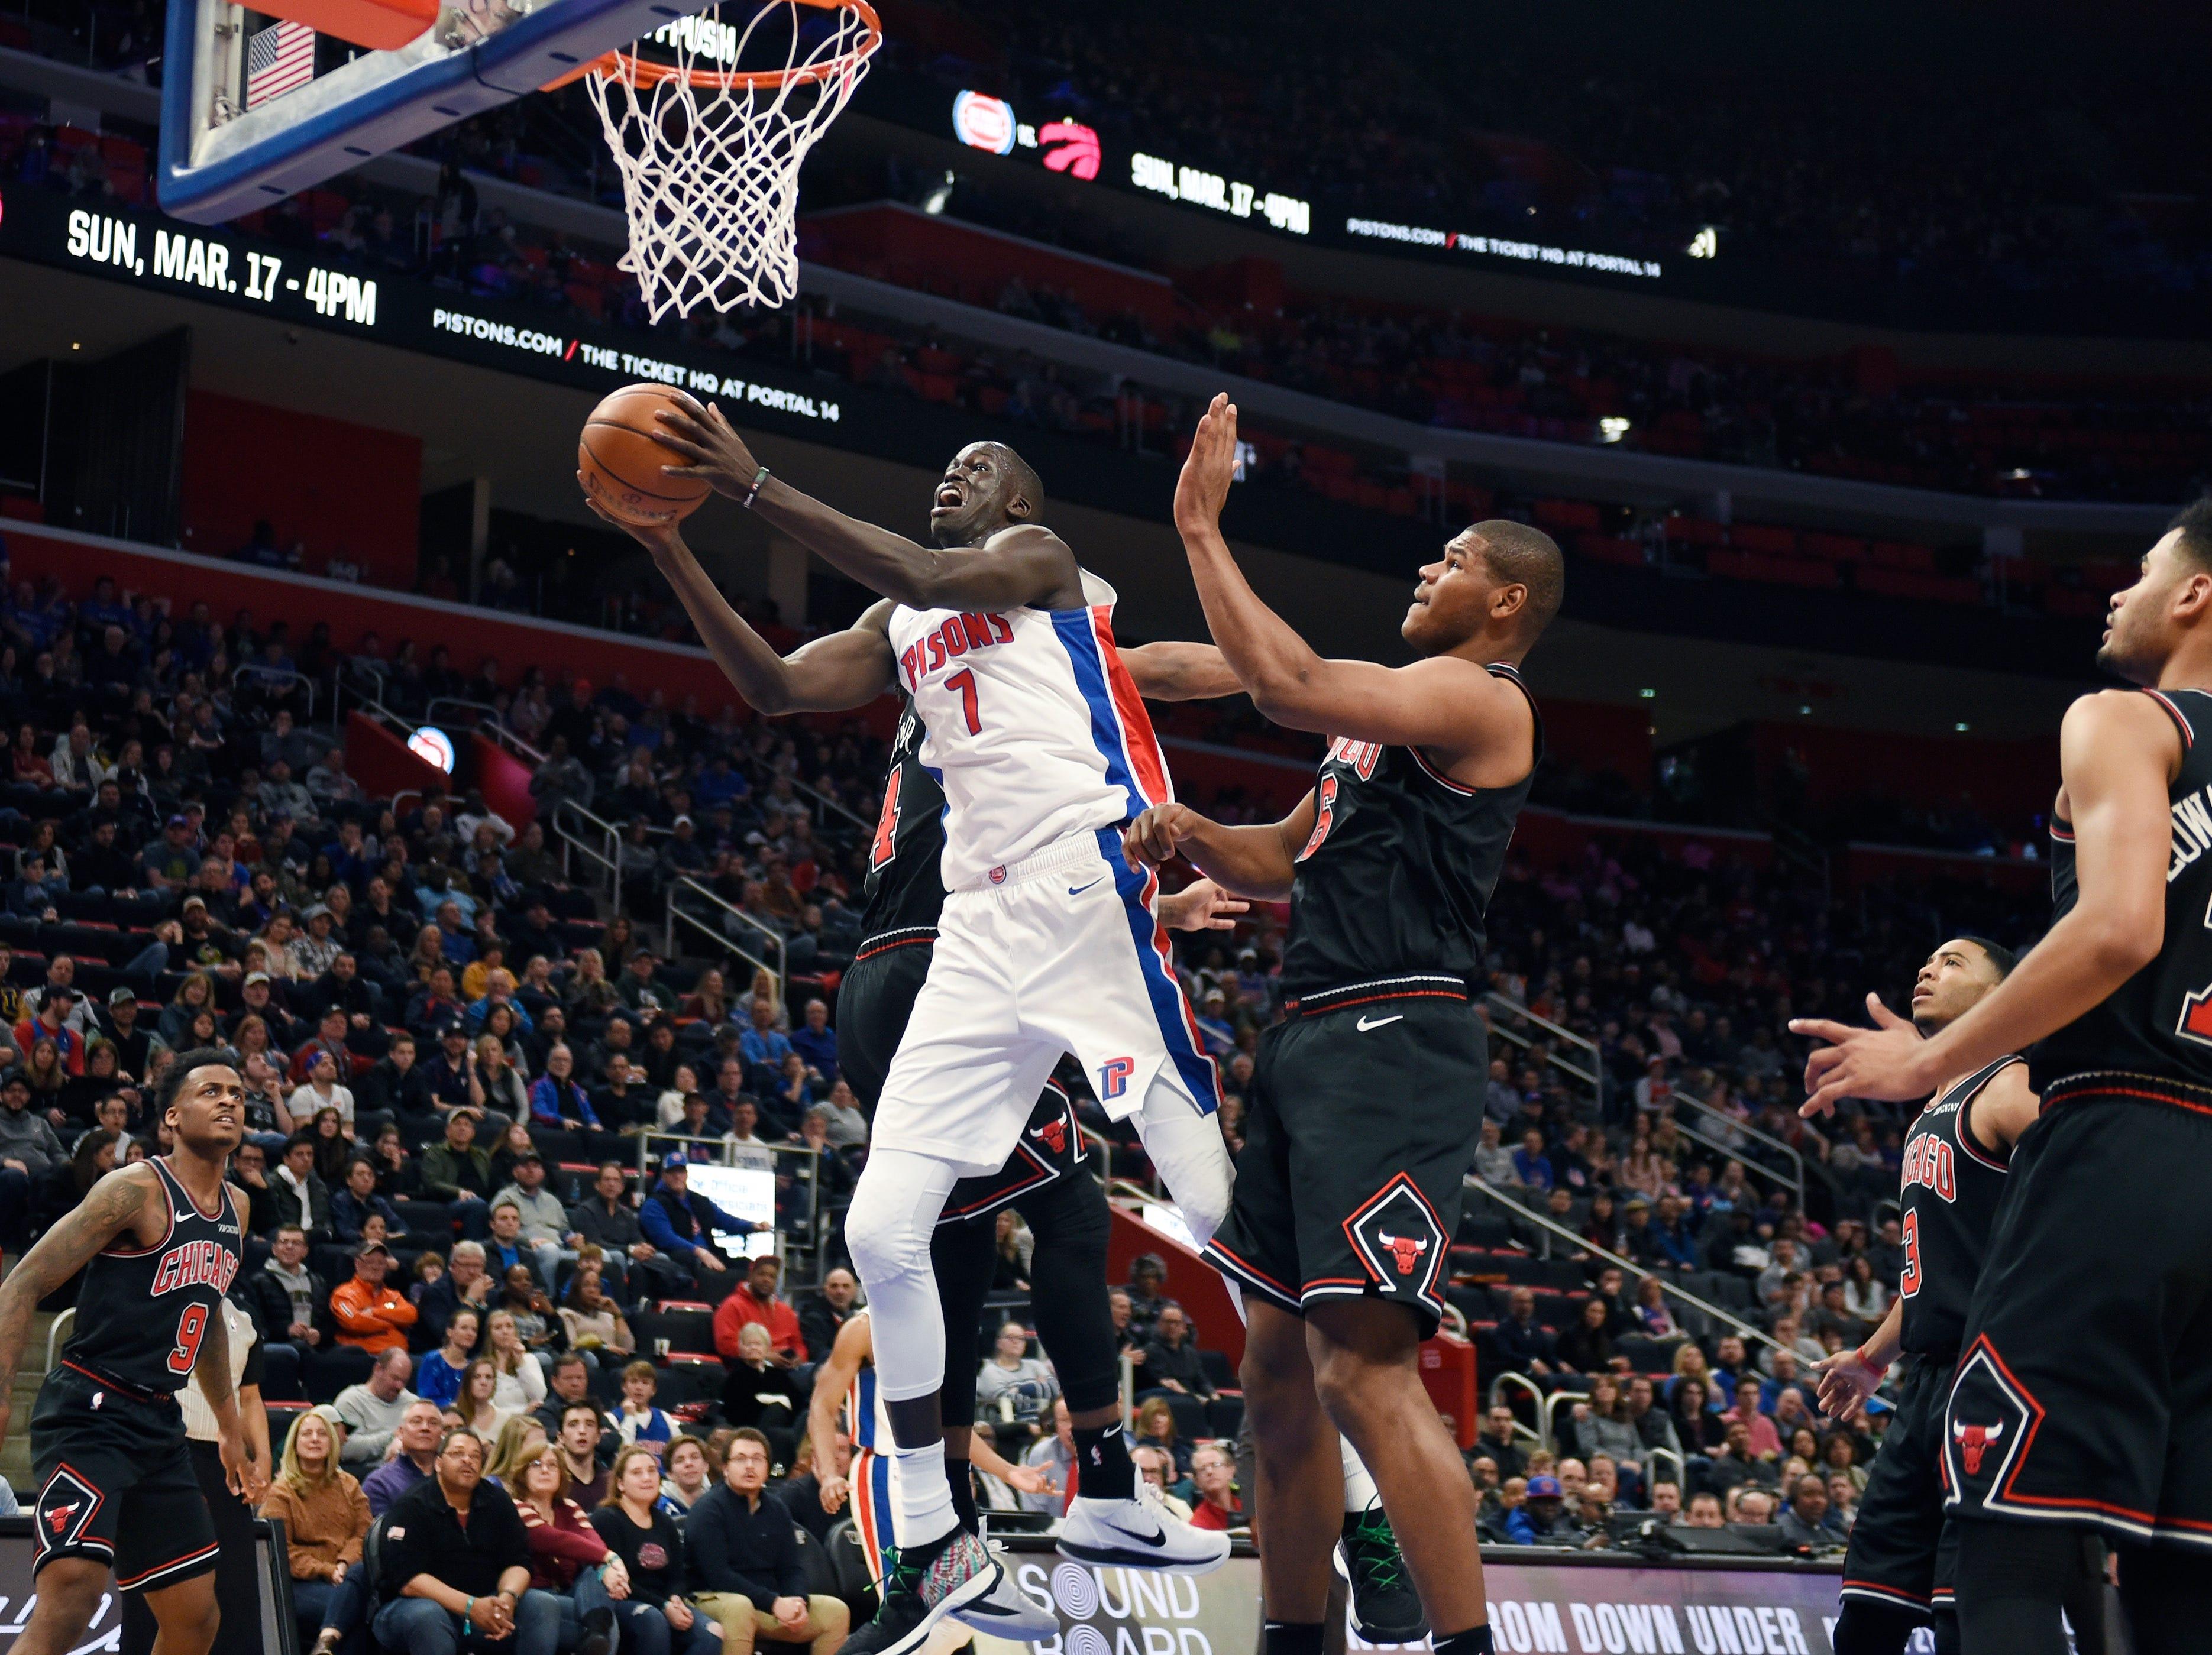 Pistons' Thon Maker shoots over Bulls' Cristiano Felicio in the fourth quarter.